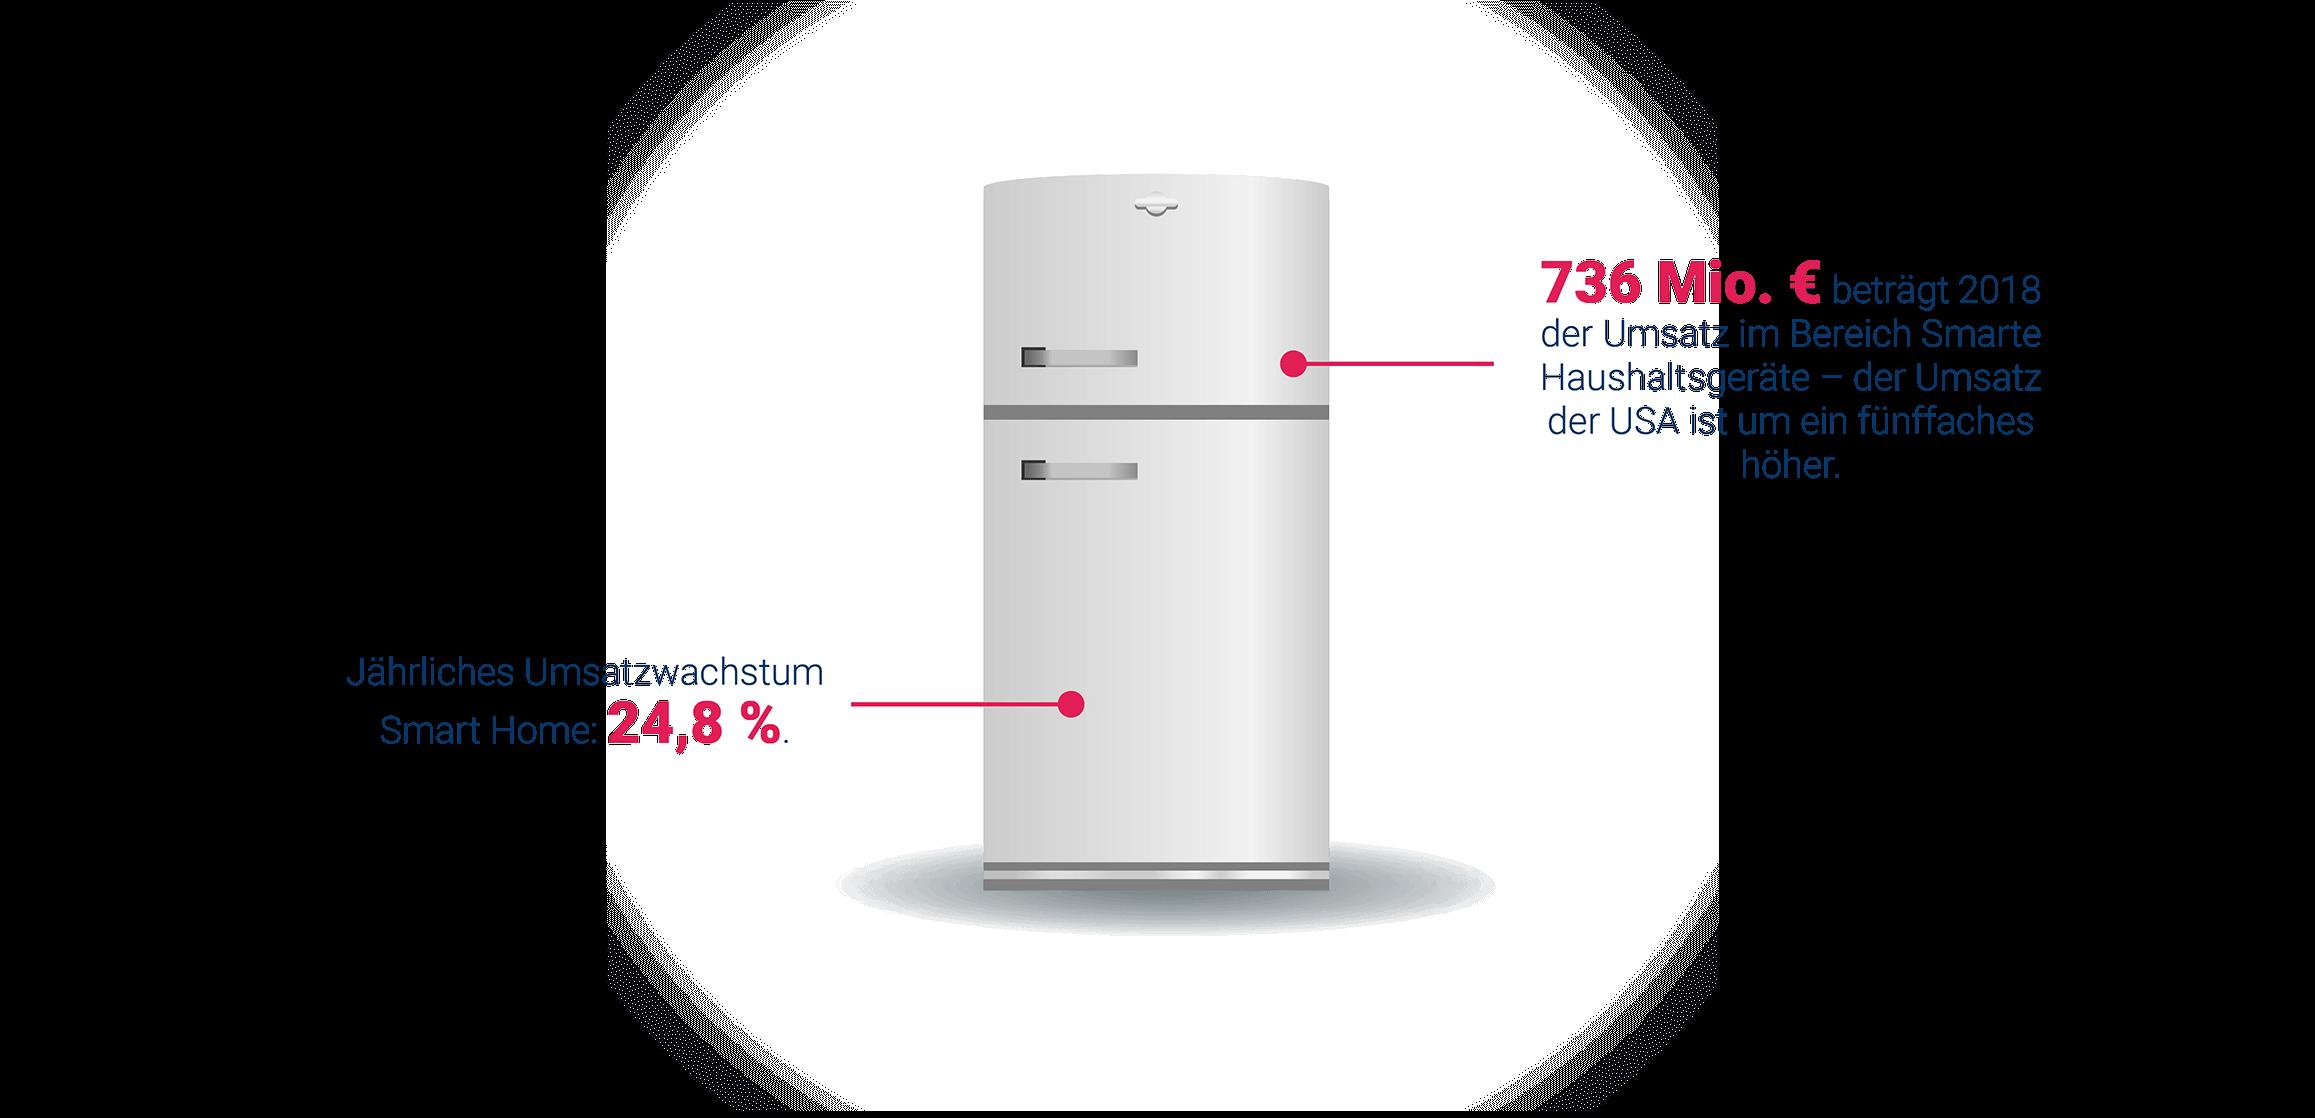 Smarte Kühlschränke